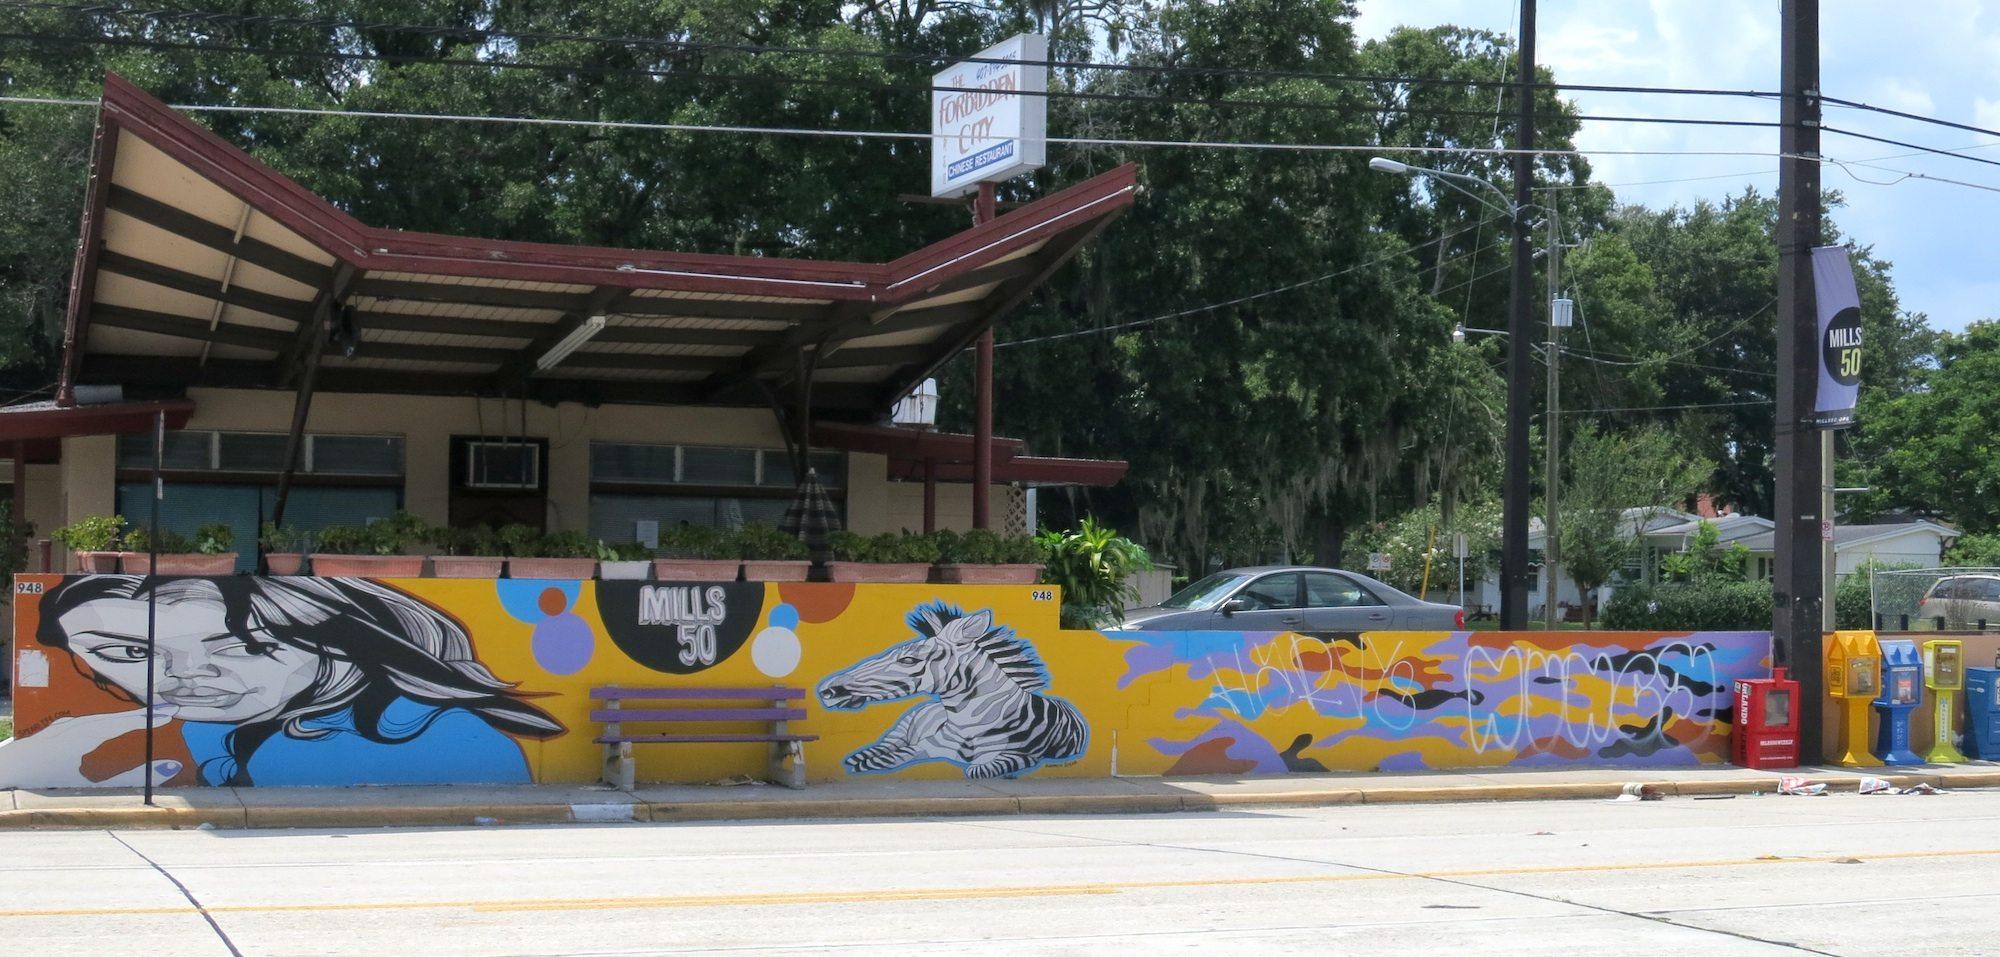 Mills 50 Mural Vandalized